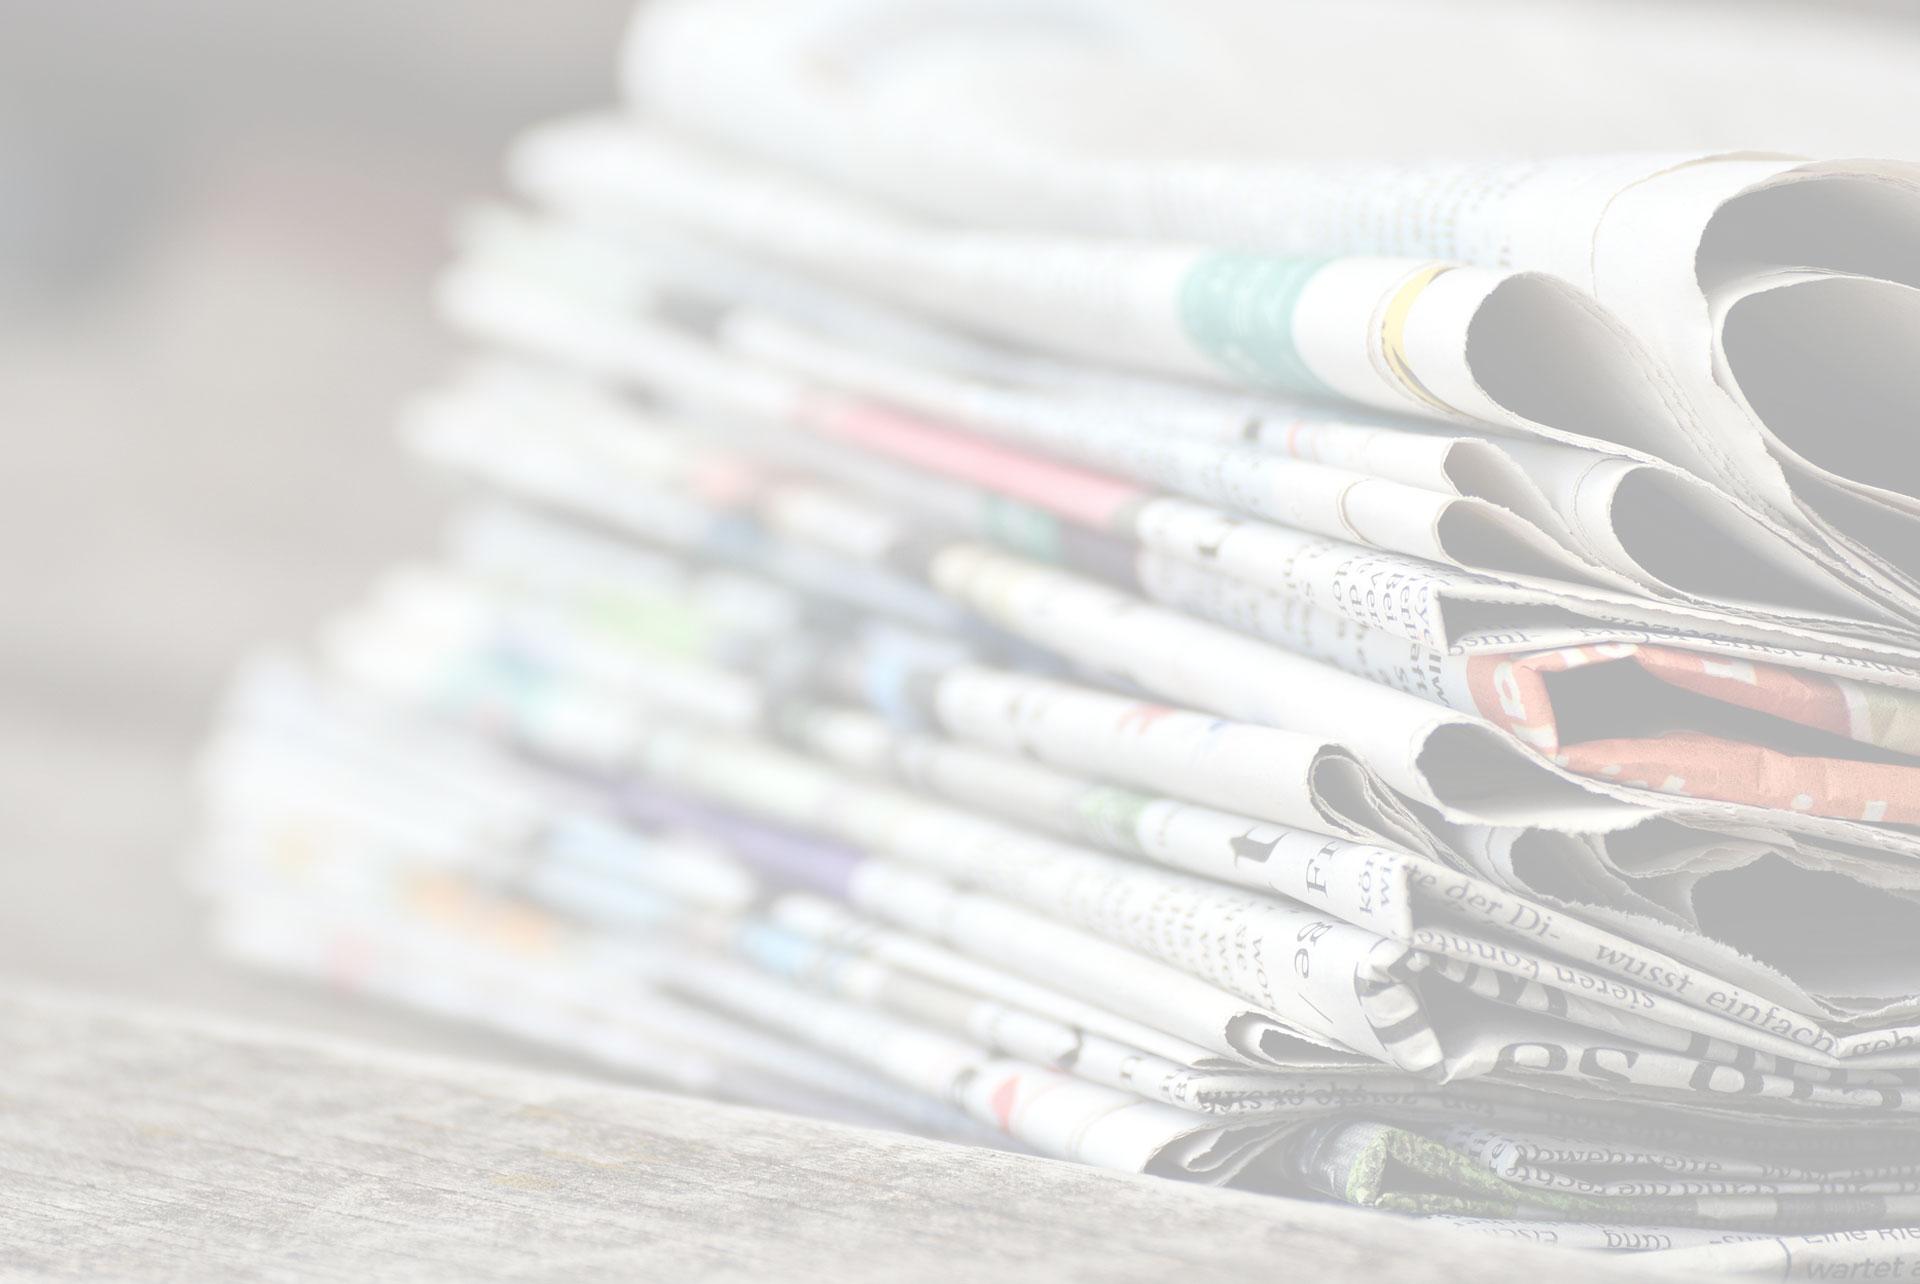 Movimento Cinque Stelle voto online